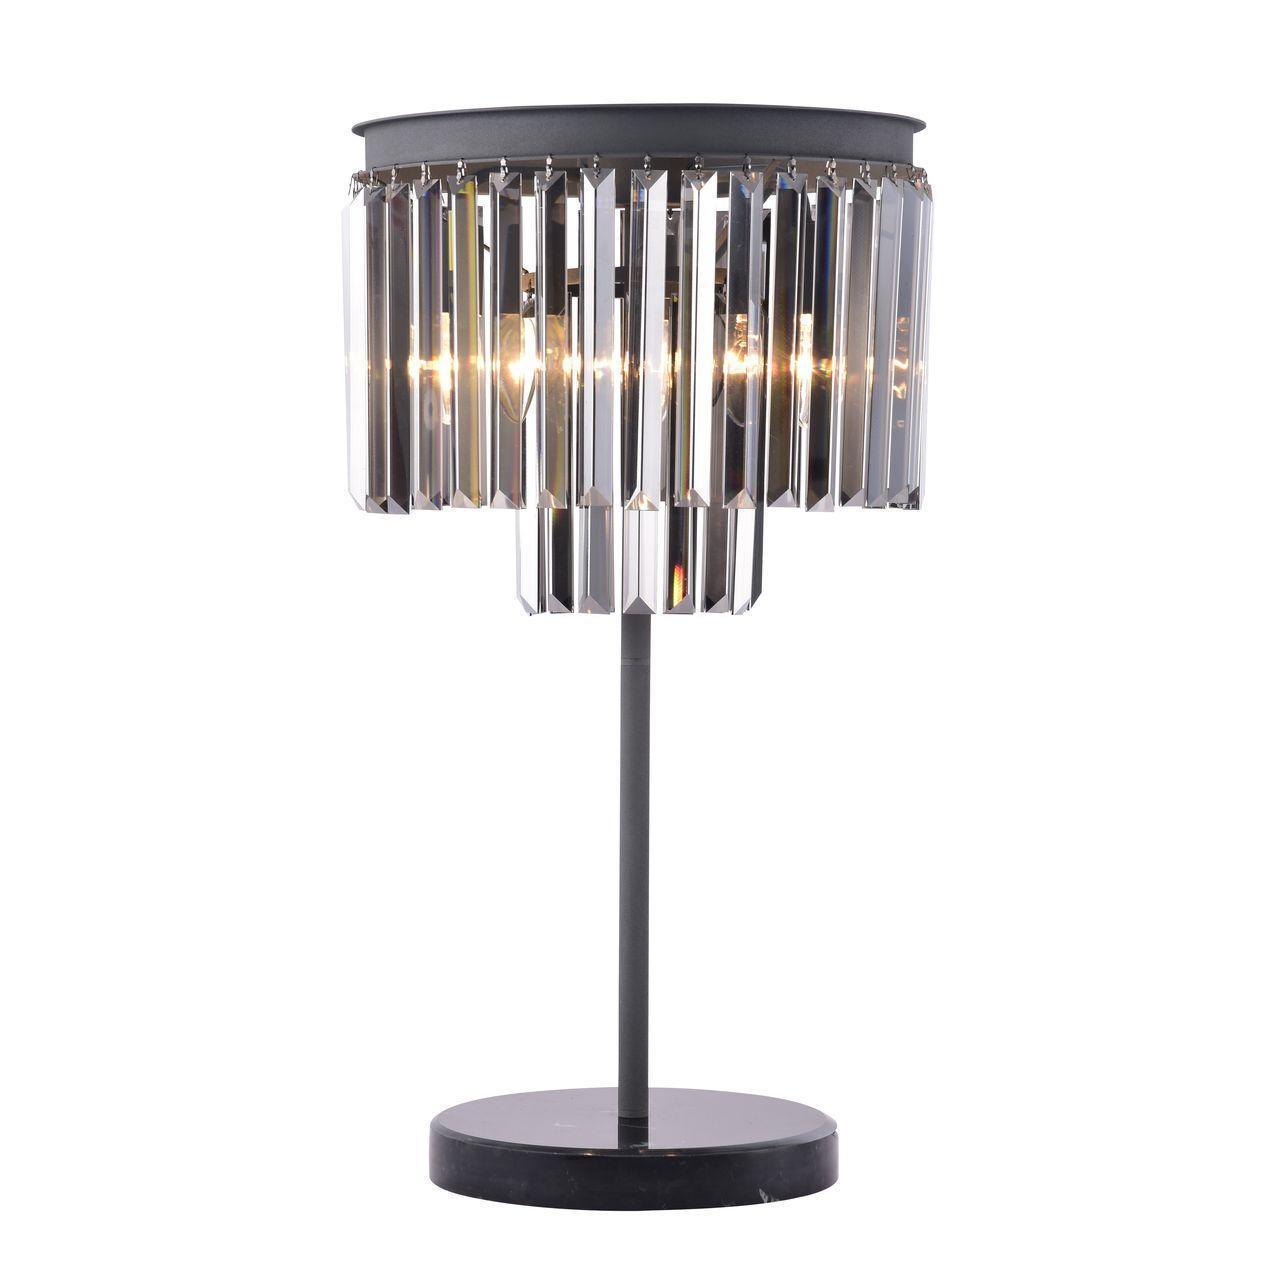 Настольная лампа Divinare Nova 3002/05 TL-3 185 55r16 83v primacy 3 tl